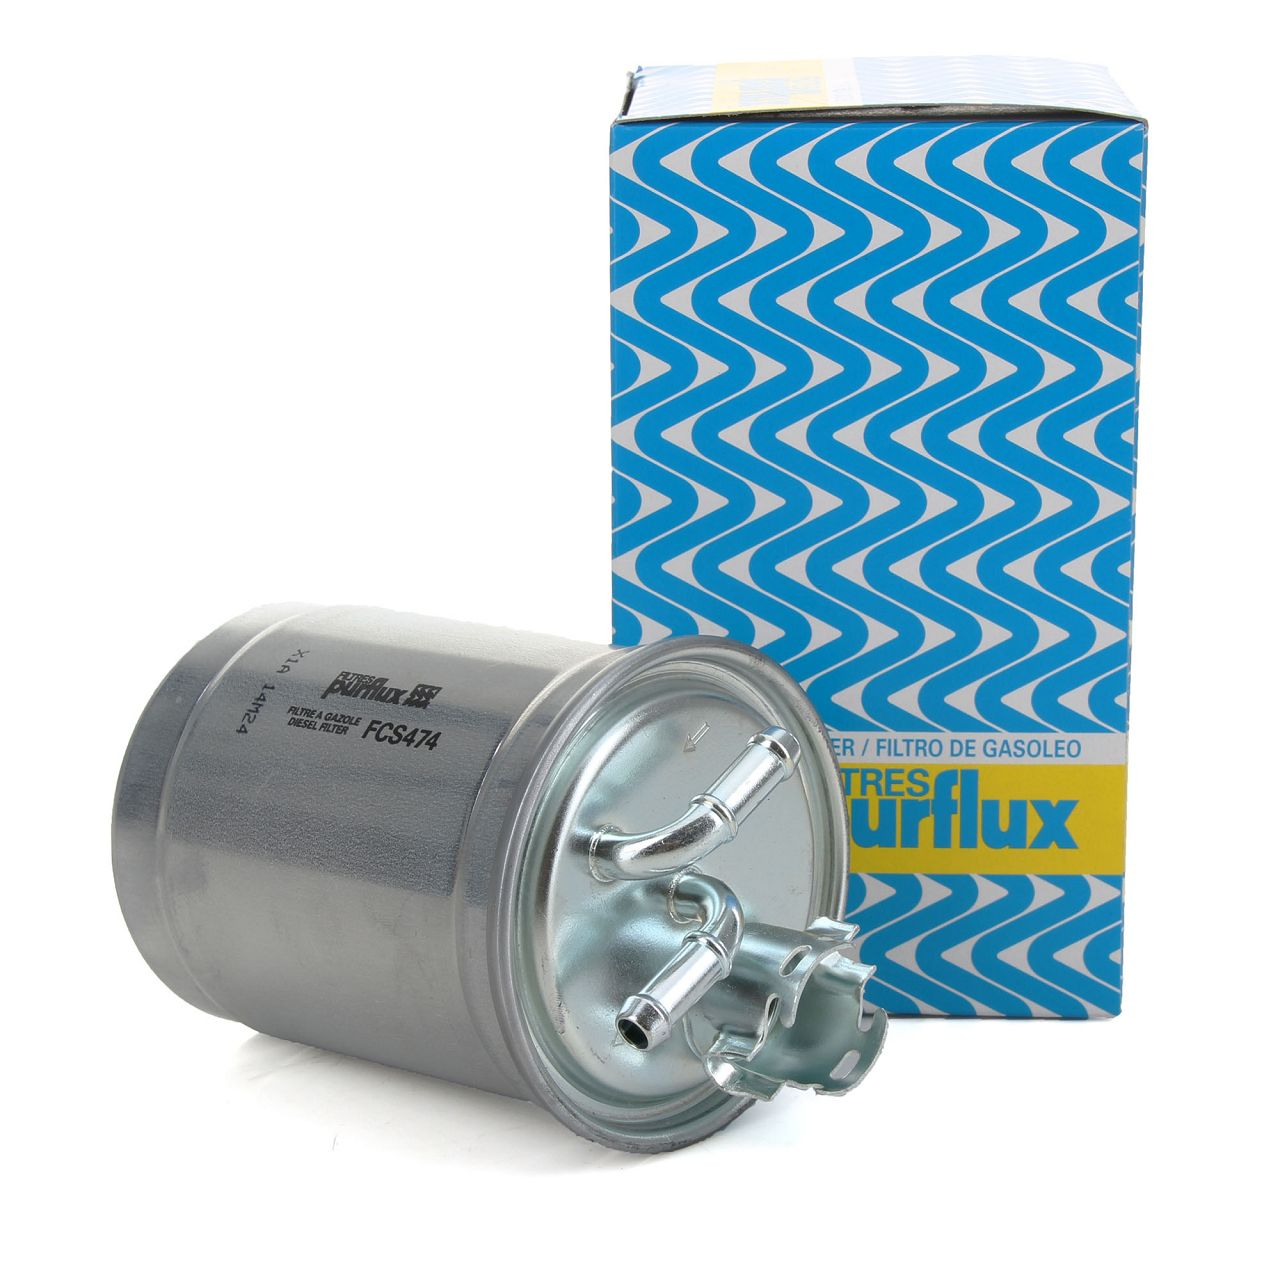 PURFLUX Kraftstofffilter Dieselfilter für Seat Cordoba Ibiza VW Caddy Polo 1.9D